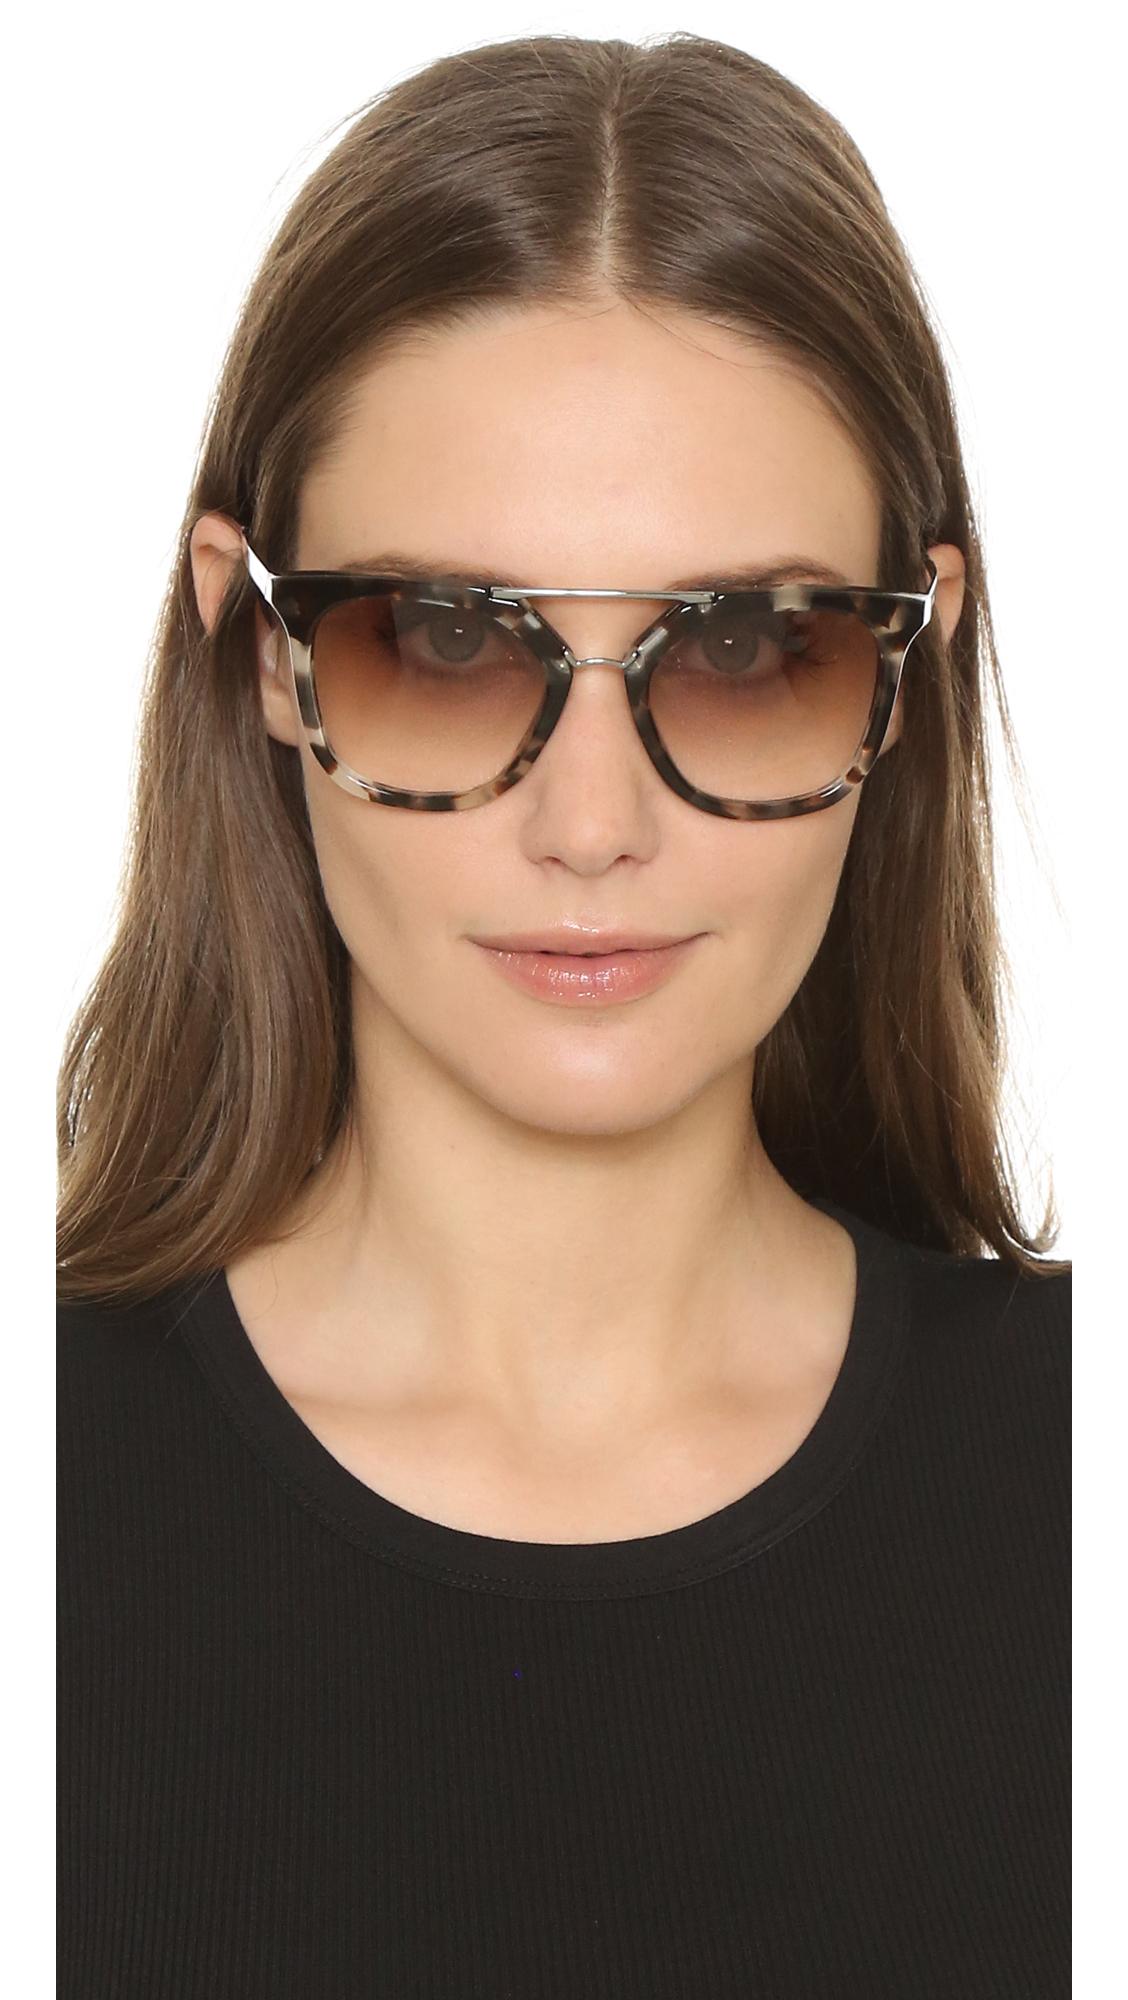 ca240af0b Prada Thick Frame Aviator Sunglasses in Brown - Lyst